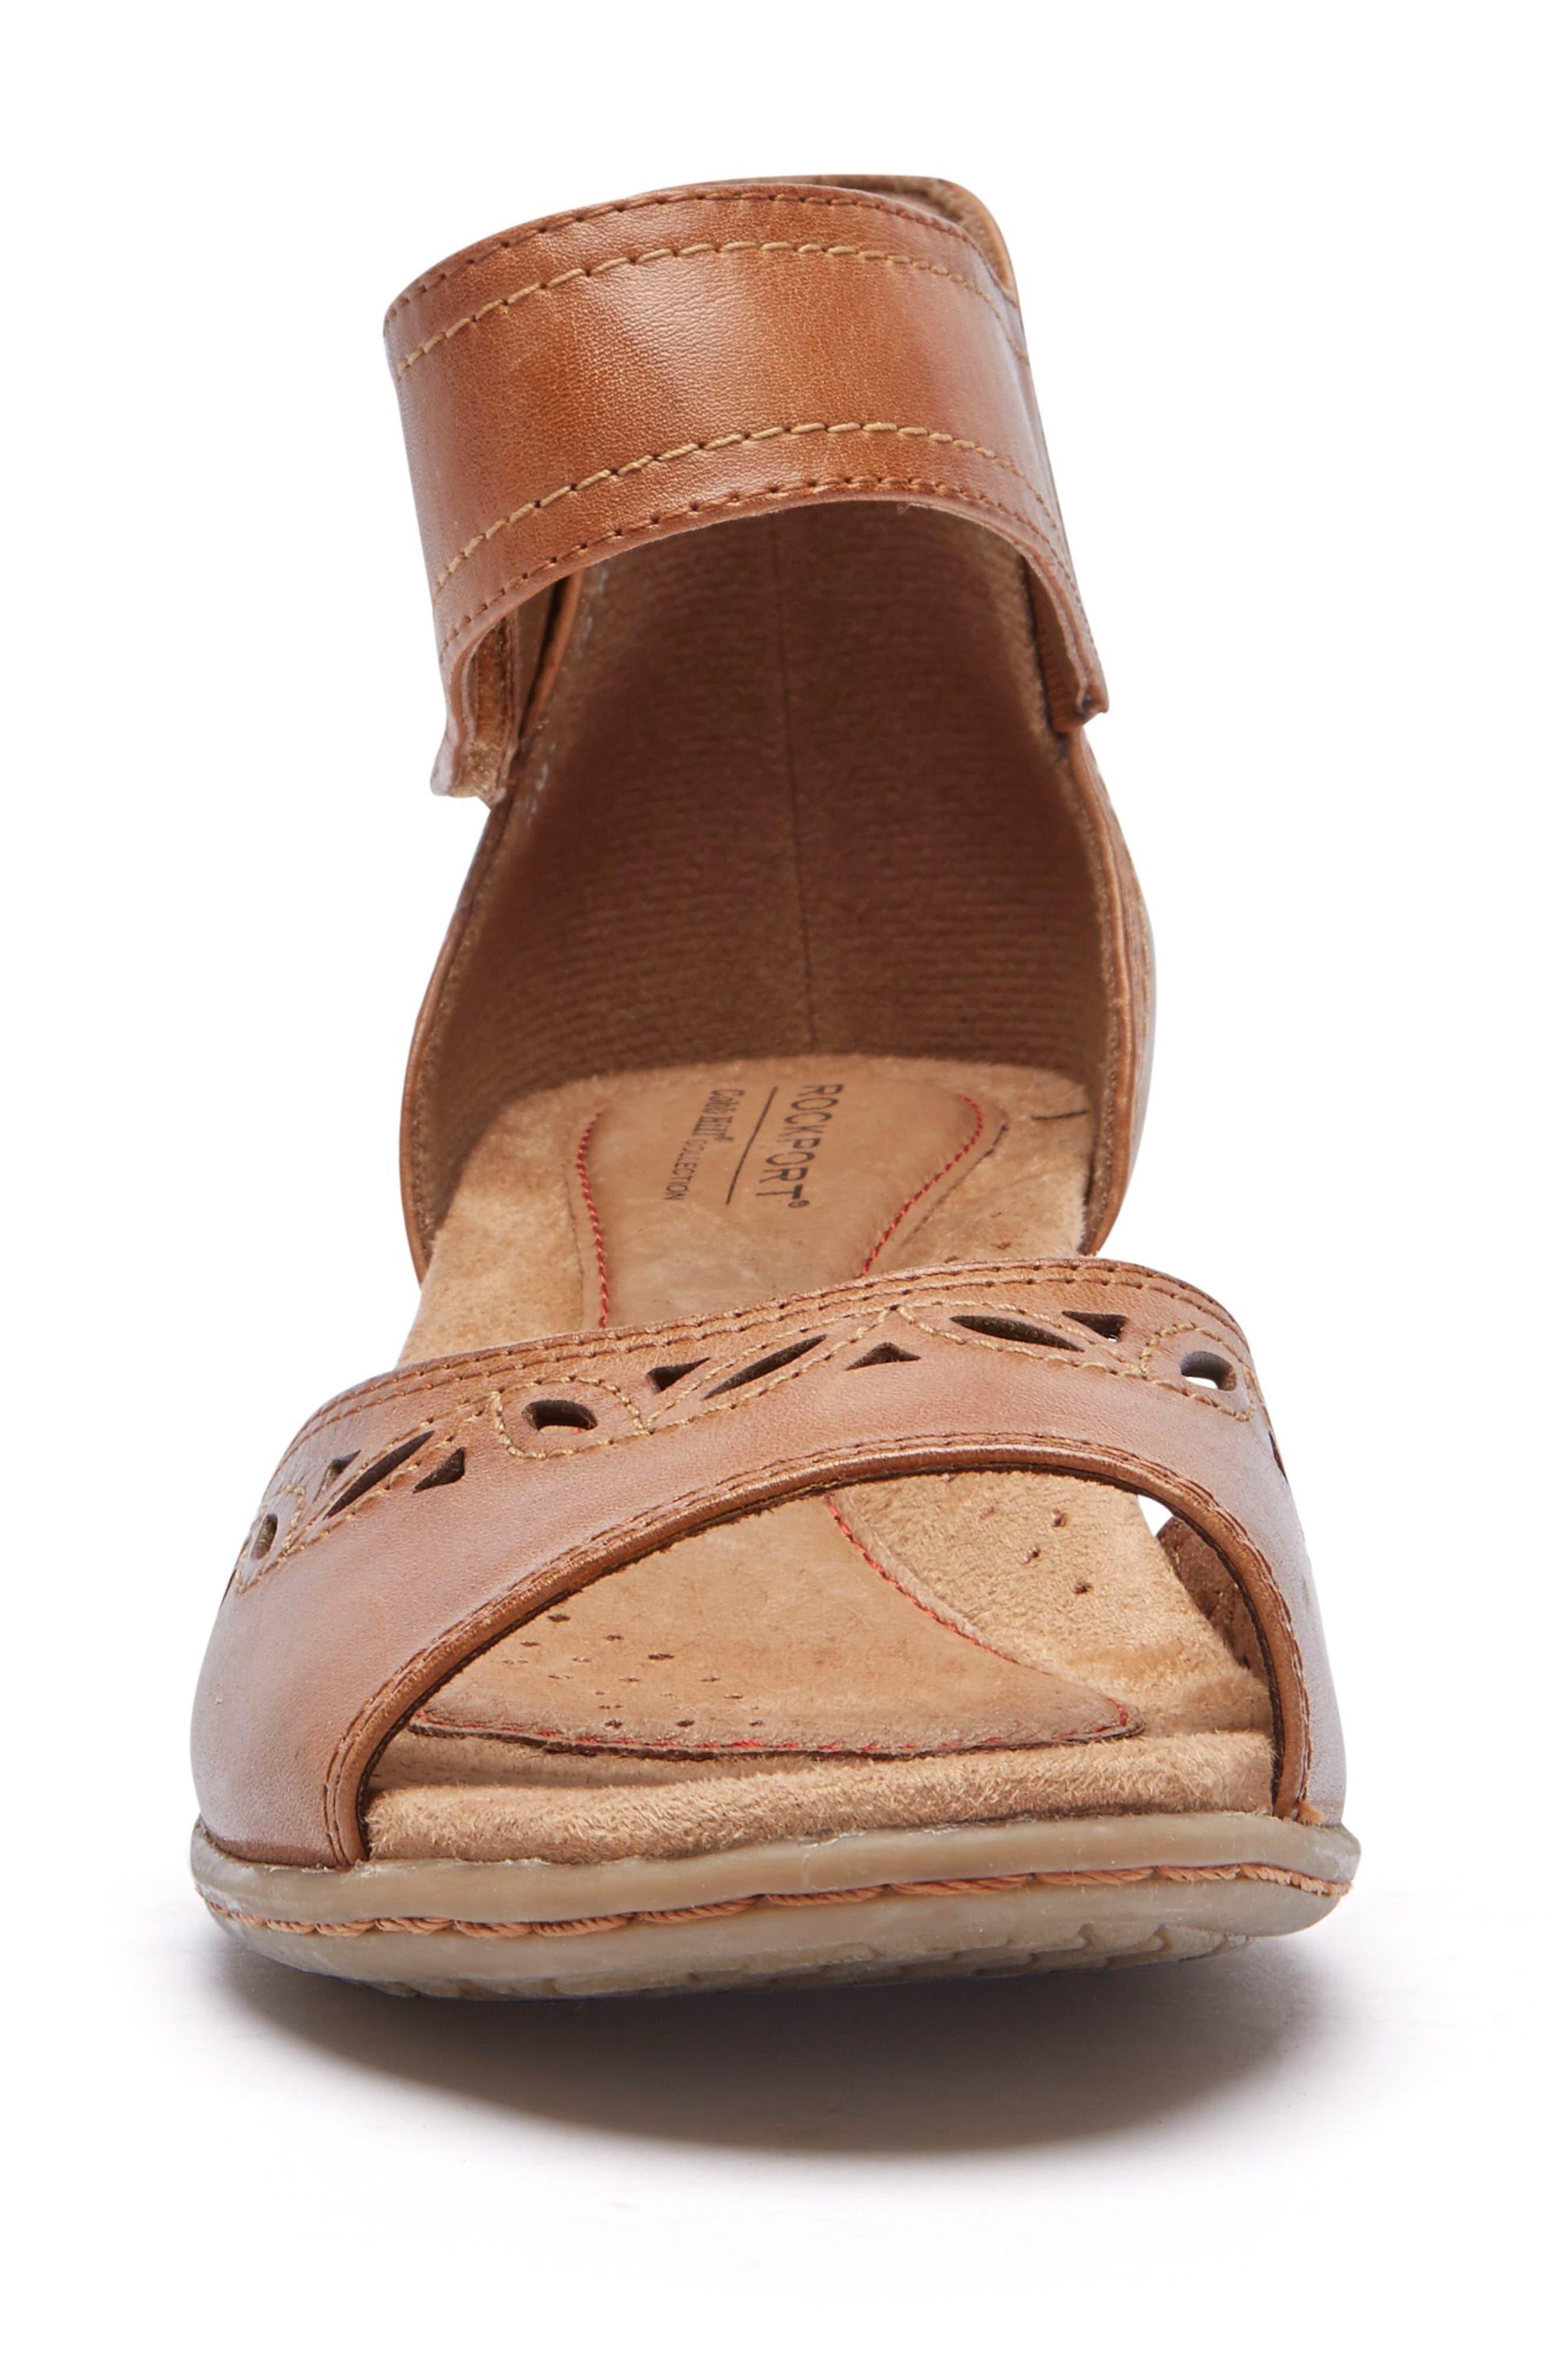 Abbott Perforated Sandal,                             Alternate thumbnail 4, color,                             Tan Leather